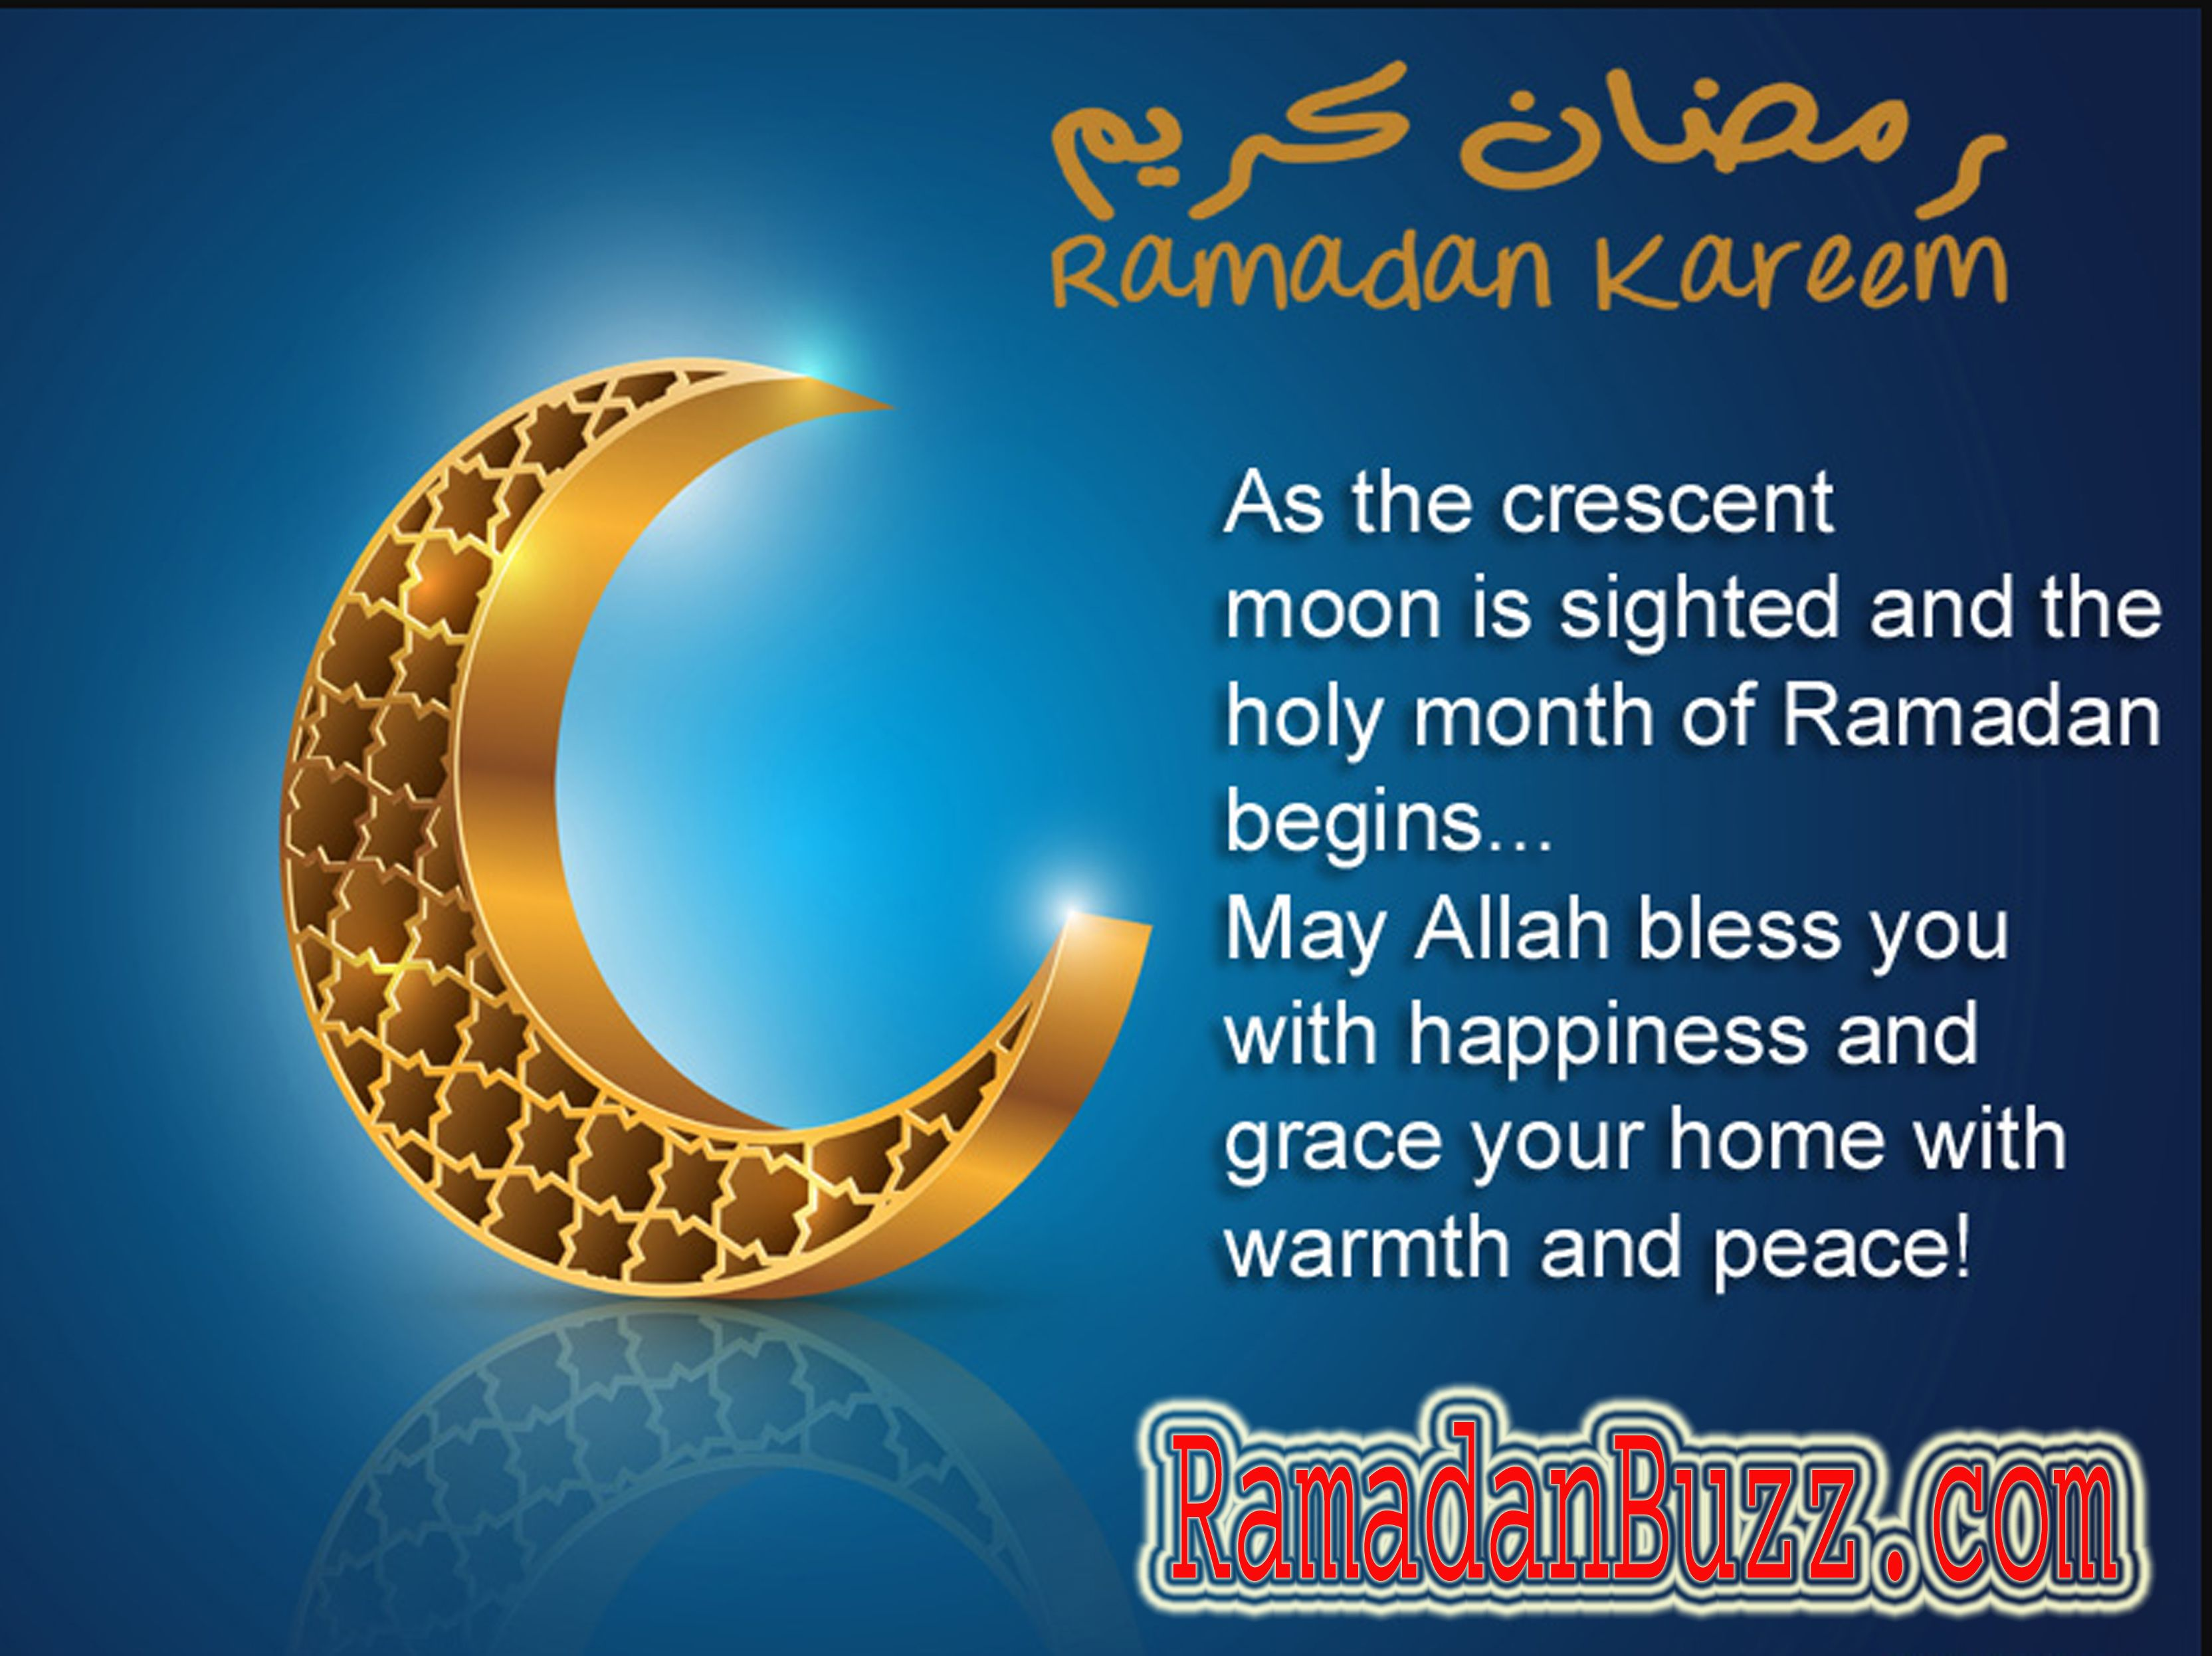 Happy Ramadan Mubarak Wishes 2019 Ramadan Special Ramadankareemwishes Happyramadanwishes Ramadanwishes Ramadan Wishes Ramadan Quotes Happy Ramadan Mubarak